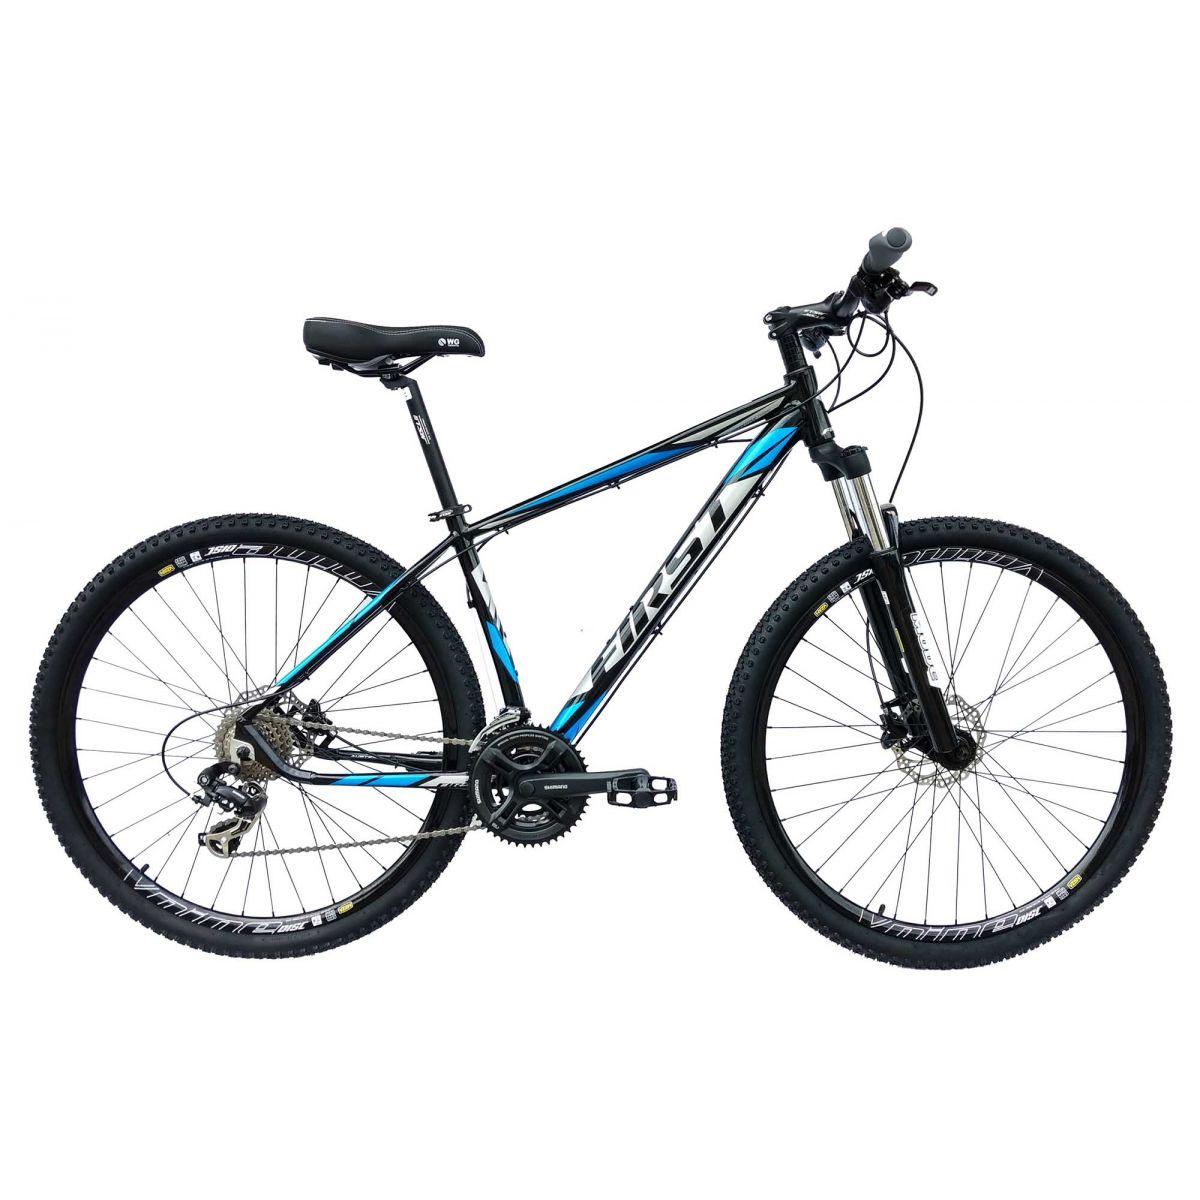 Bike 29er First Austen 24v Shimano Freio Disco Hidraulico